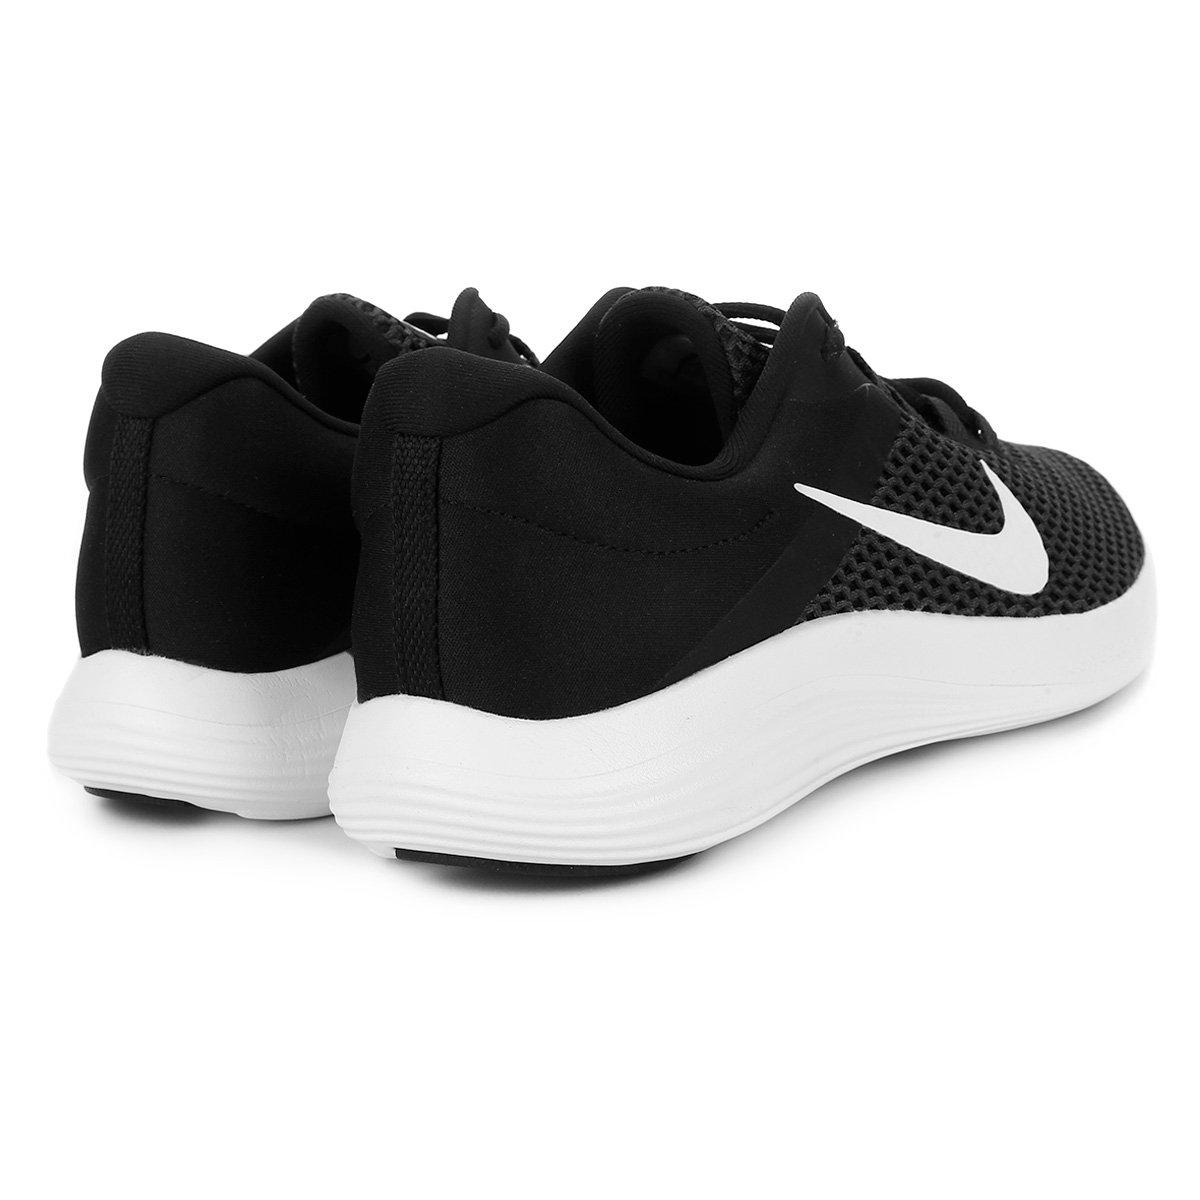 Tênis Nike Lunarconverge 2 Masculino - Preto e Branco - Compre Agora ... 1ff588c4f2030